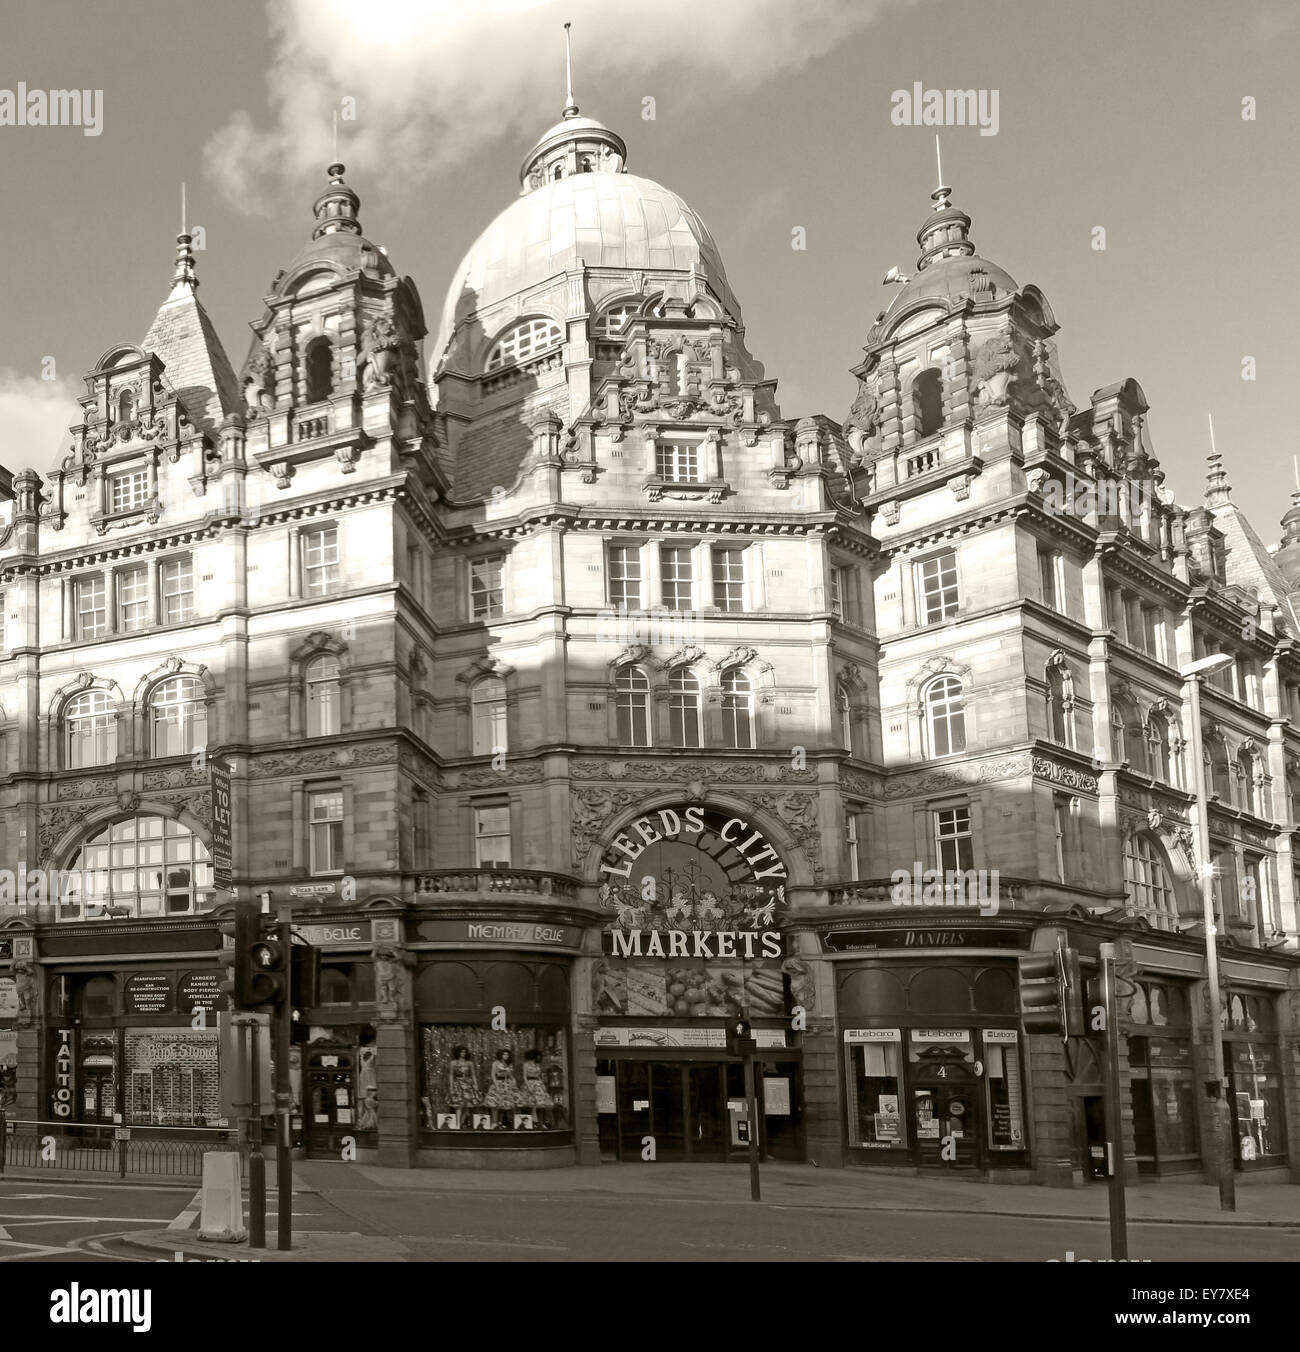 Leeds Kirkgate City Market building panorama, largest covered market in Europe,Vicar Lane - Stock Image